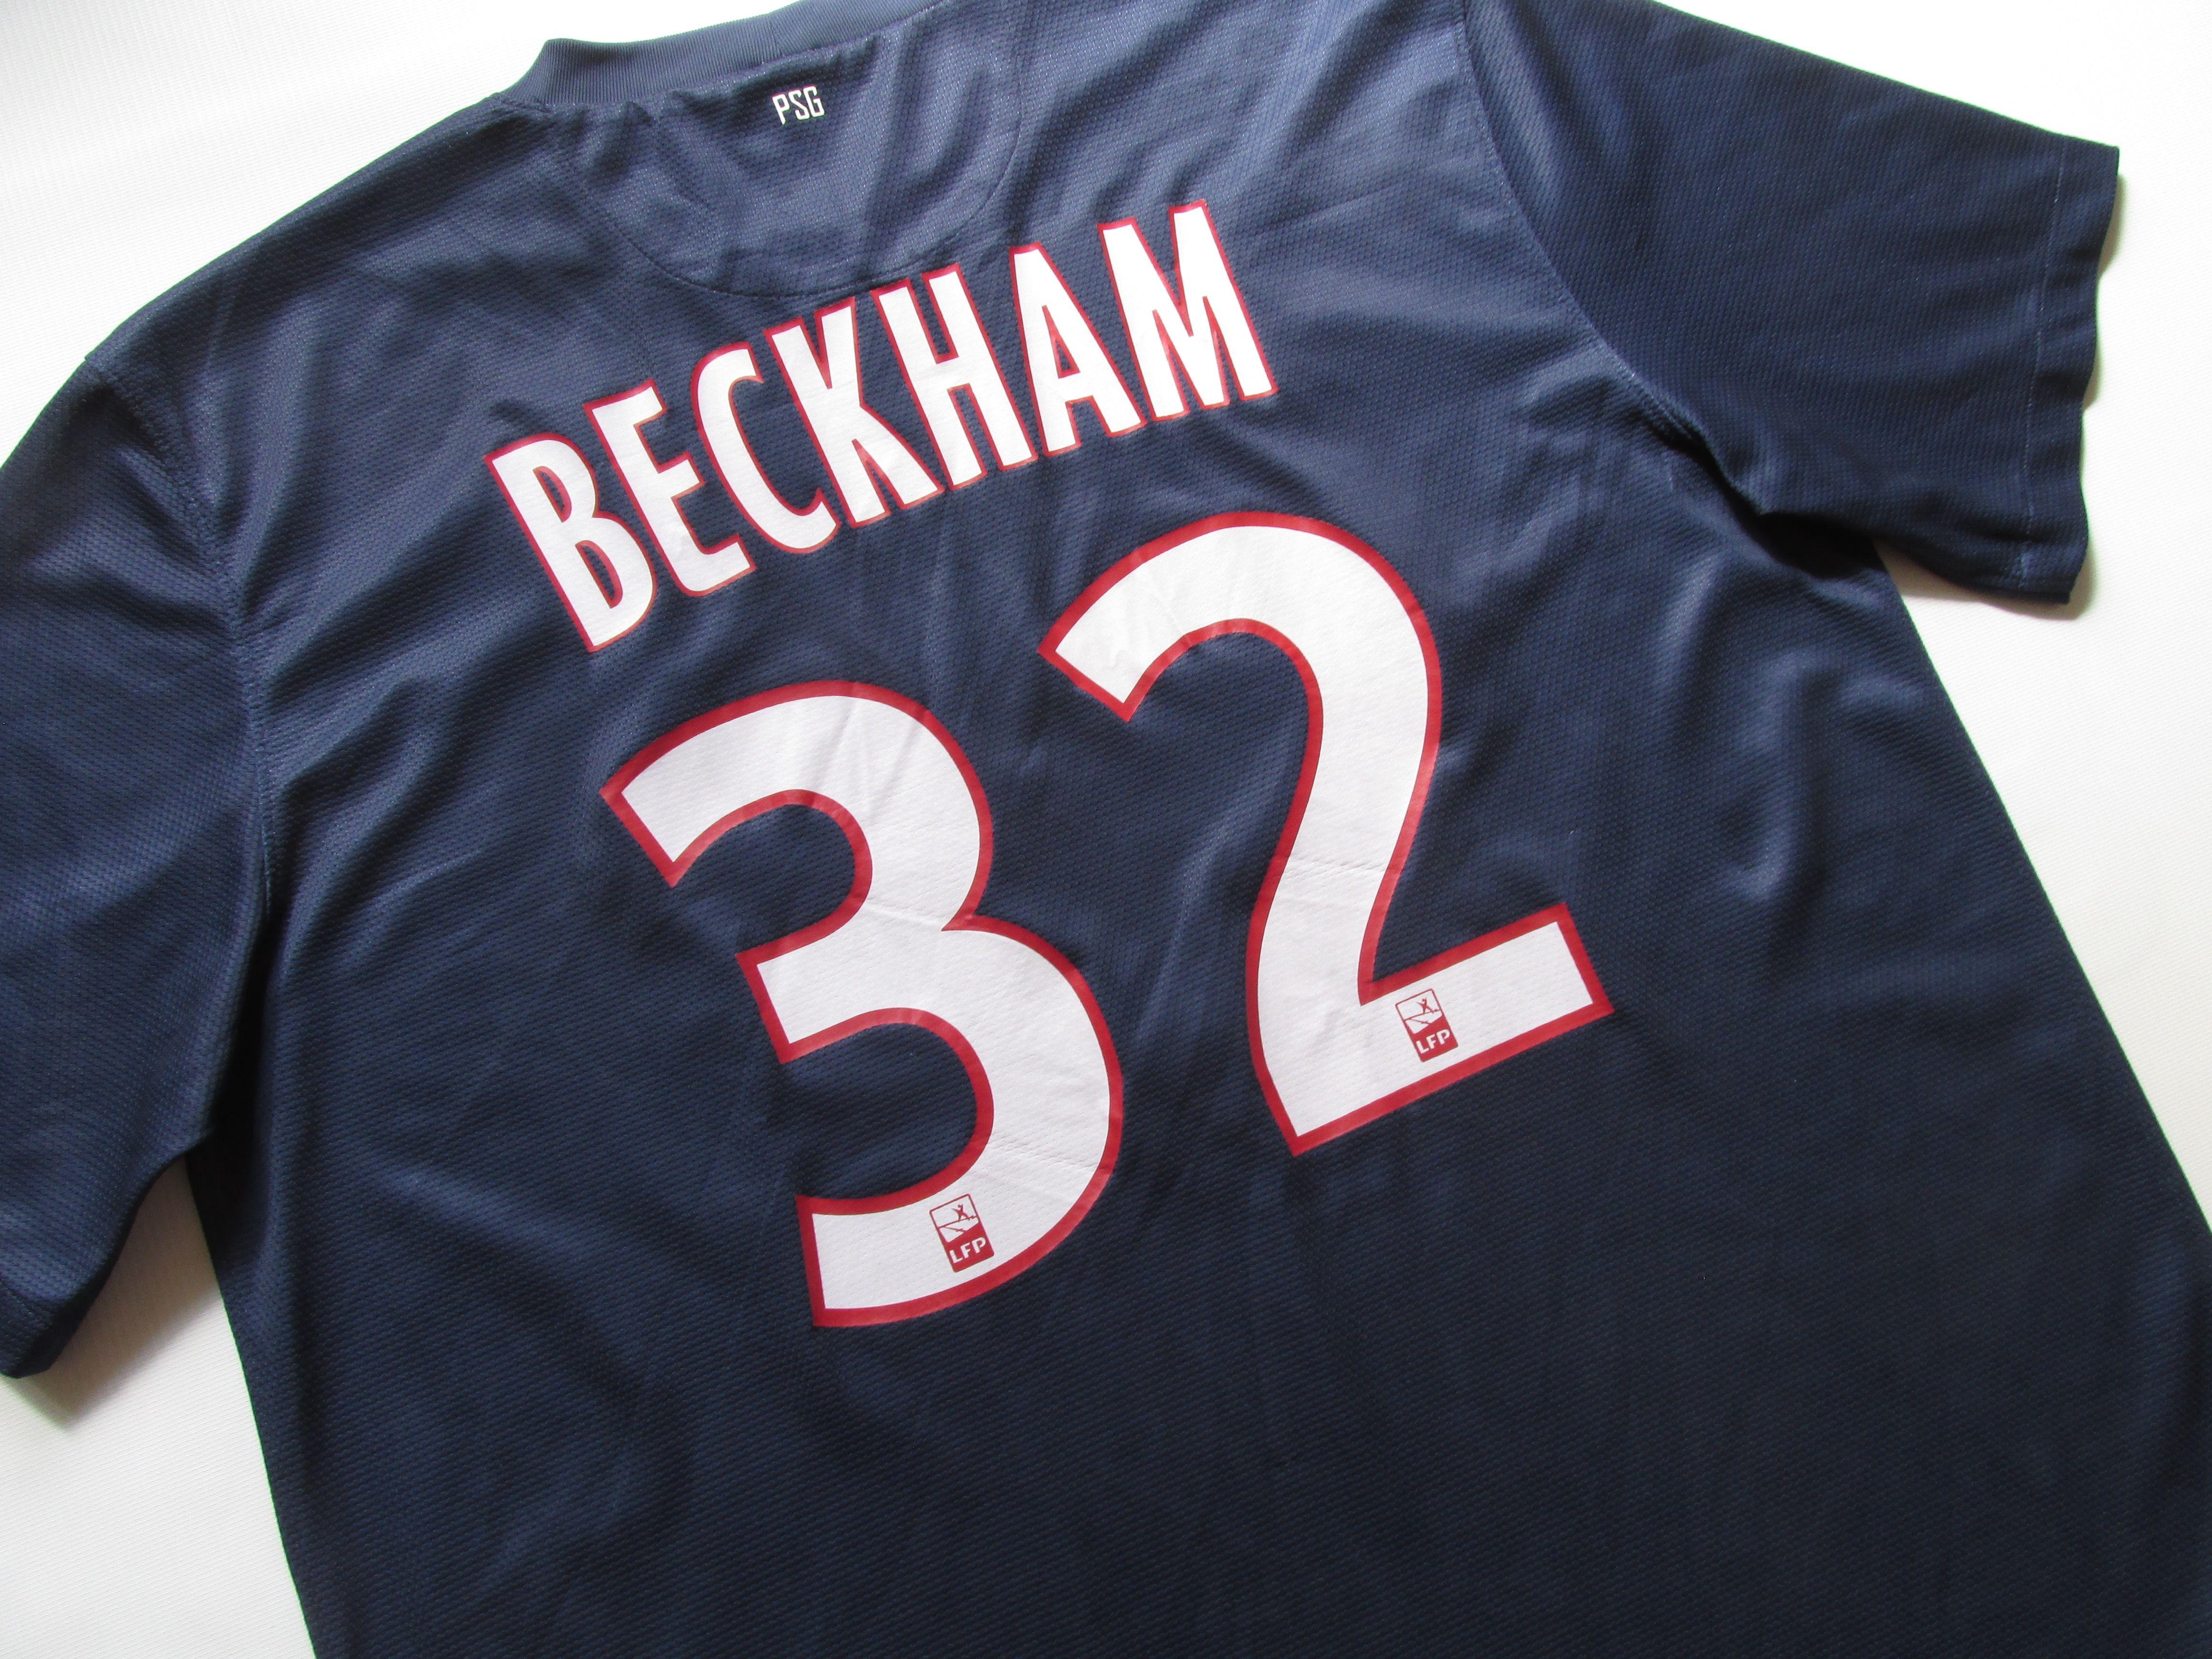 8b7def75869 Paris Saint-Germain 2012 2013 home David Beckham  32 football shirt by Nike  PSG Becks France maillot jersey soccer  paris  parisfrance  psg ...